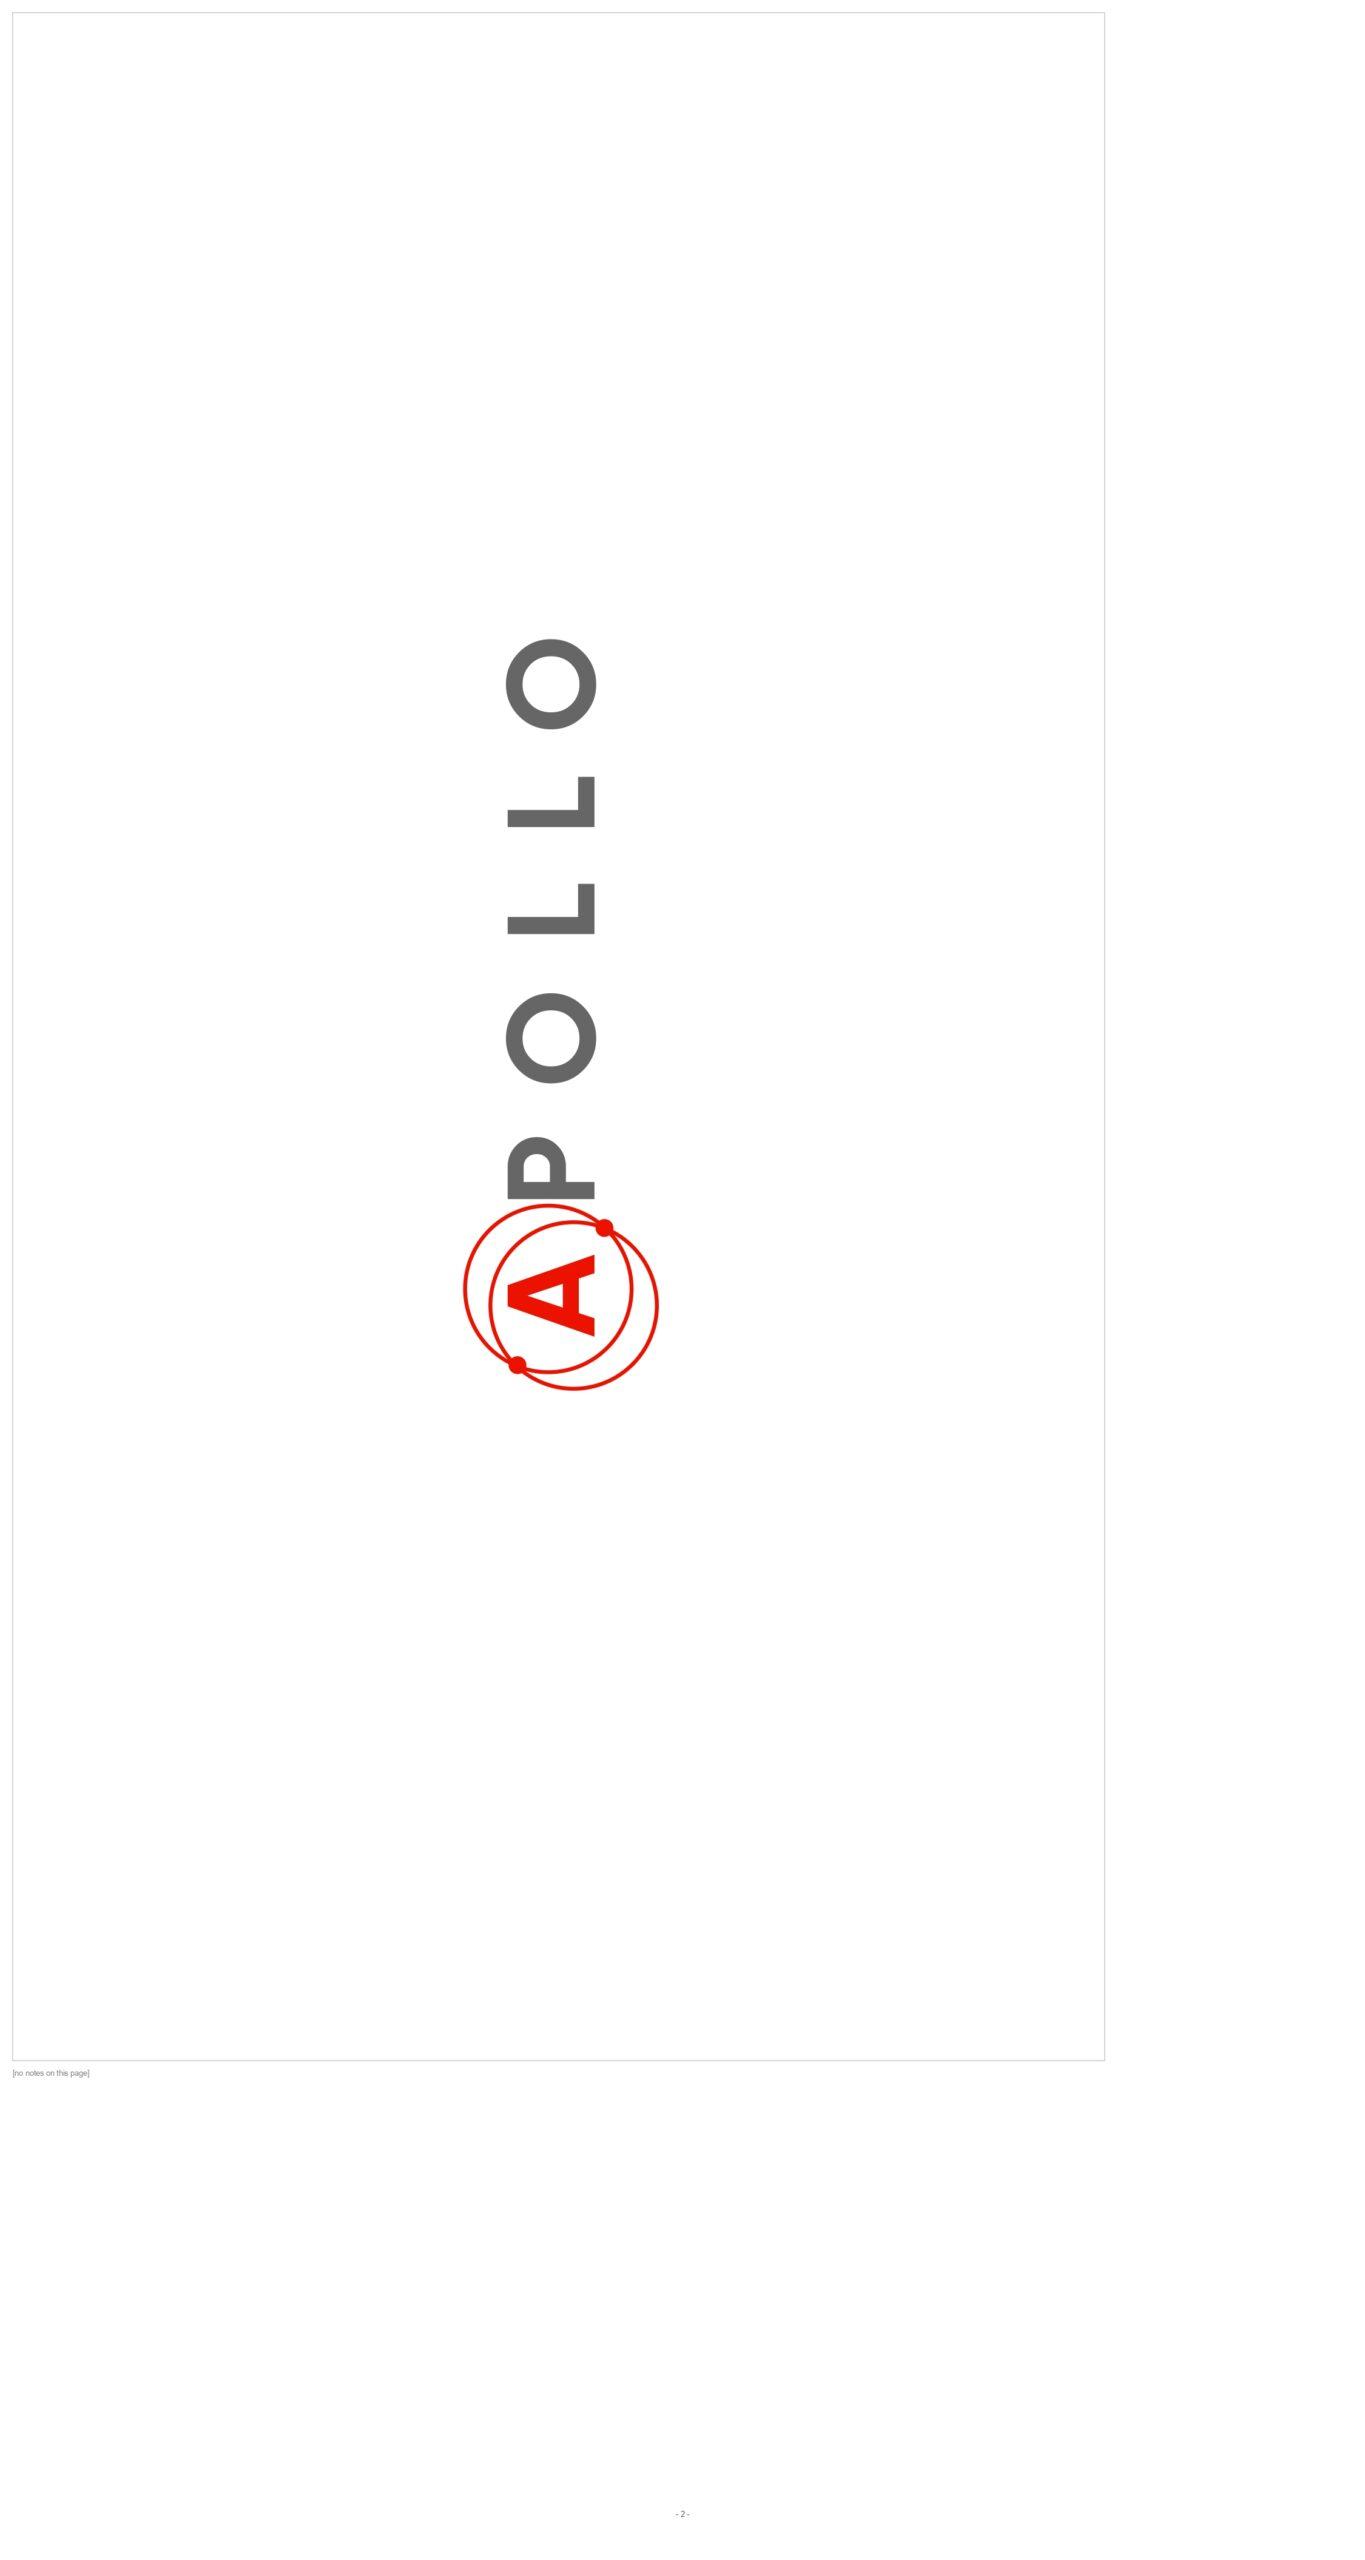 APOLLO remout visits нова правка(1)_page-0002